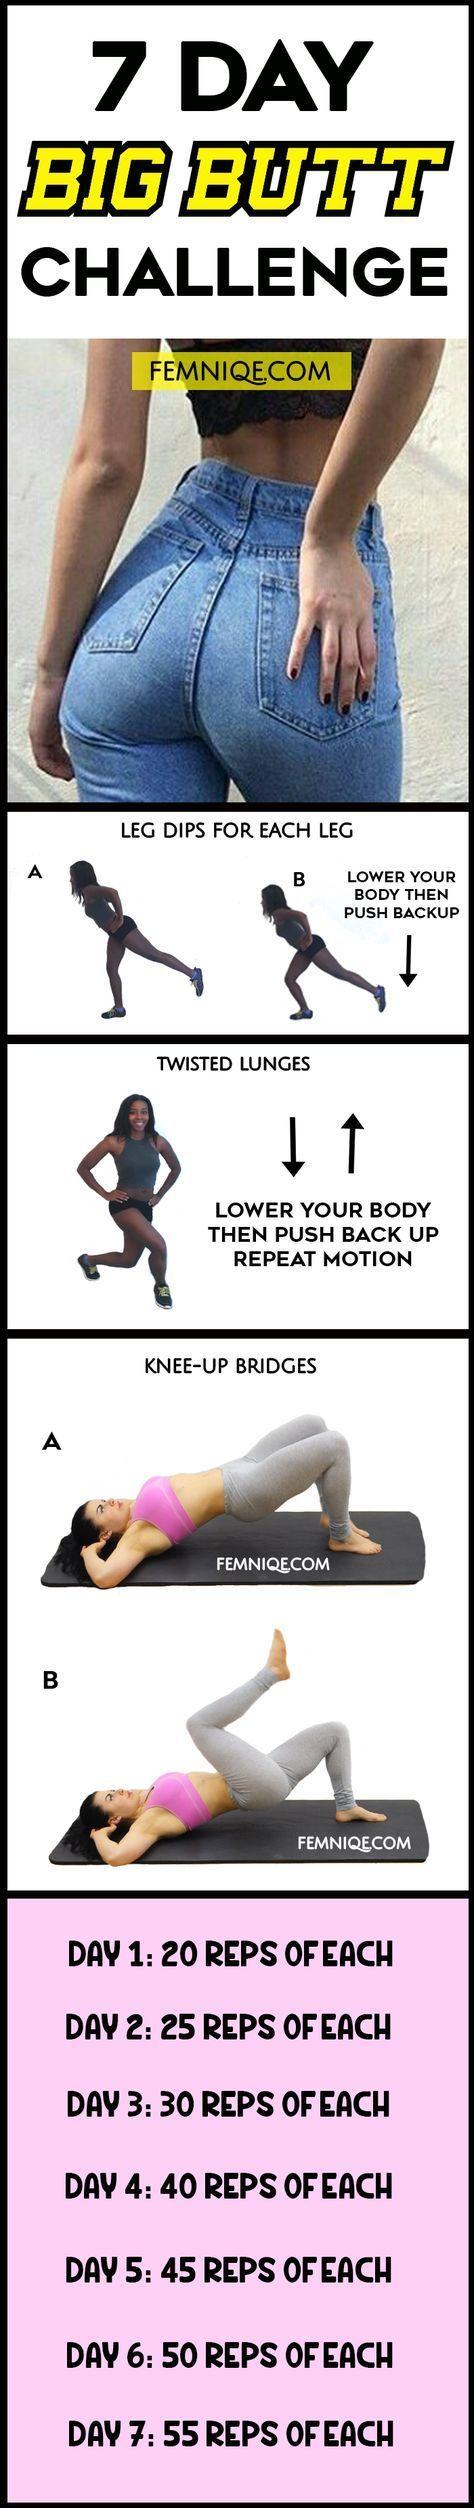 7 Day Bigger Butt Challenge (No-SquatsMarlissa Ledelay